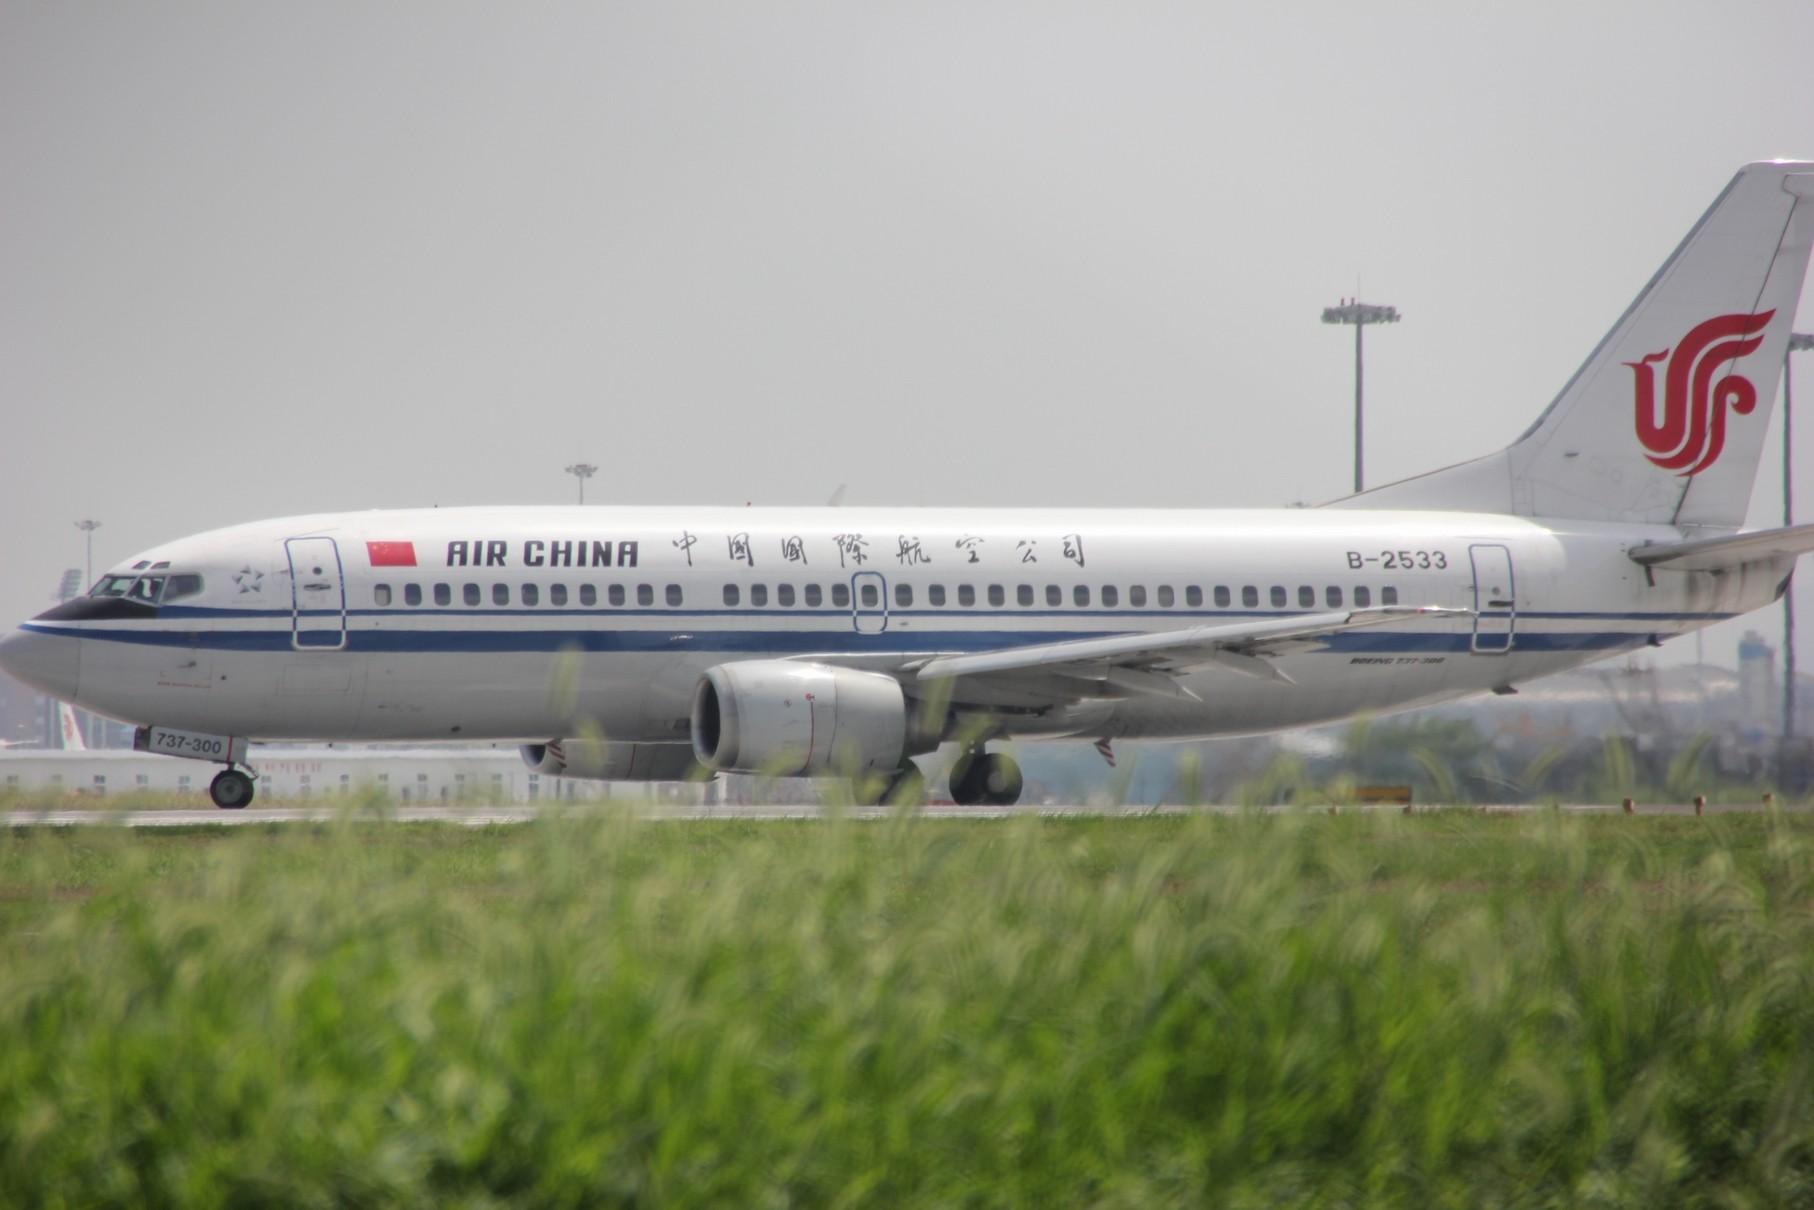 Re:[原创]{LEO拍机}新手冒着烈日酷暑,奋战在CTU!没有功劳也有苦劳吧!走过路过不要错过!欢迎各位大侠砸飞机和指点!另附有奖问答答对10个小飞机送上 BOEING 737-300 B-2533 中国成都双流机场